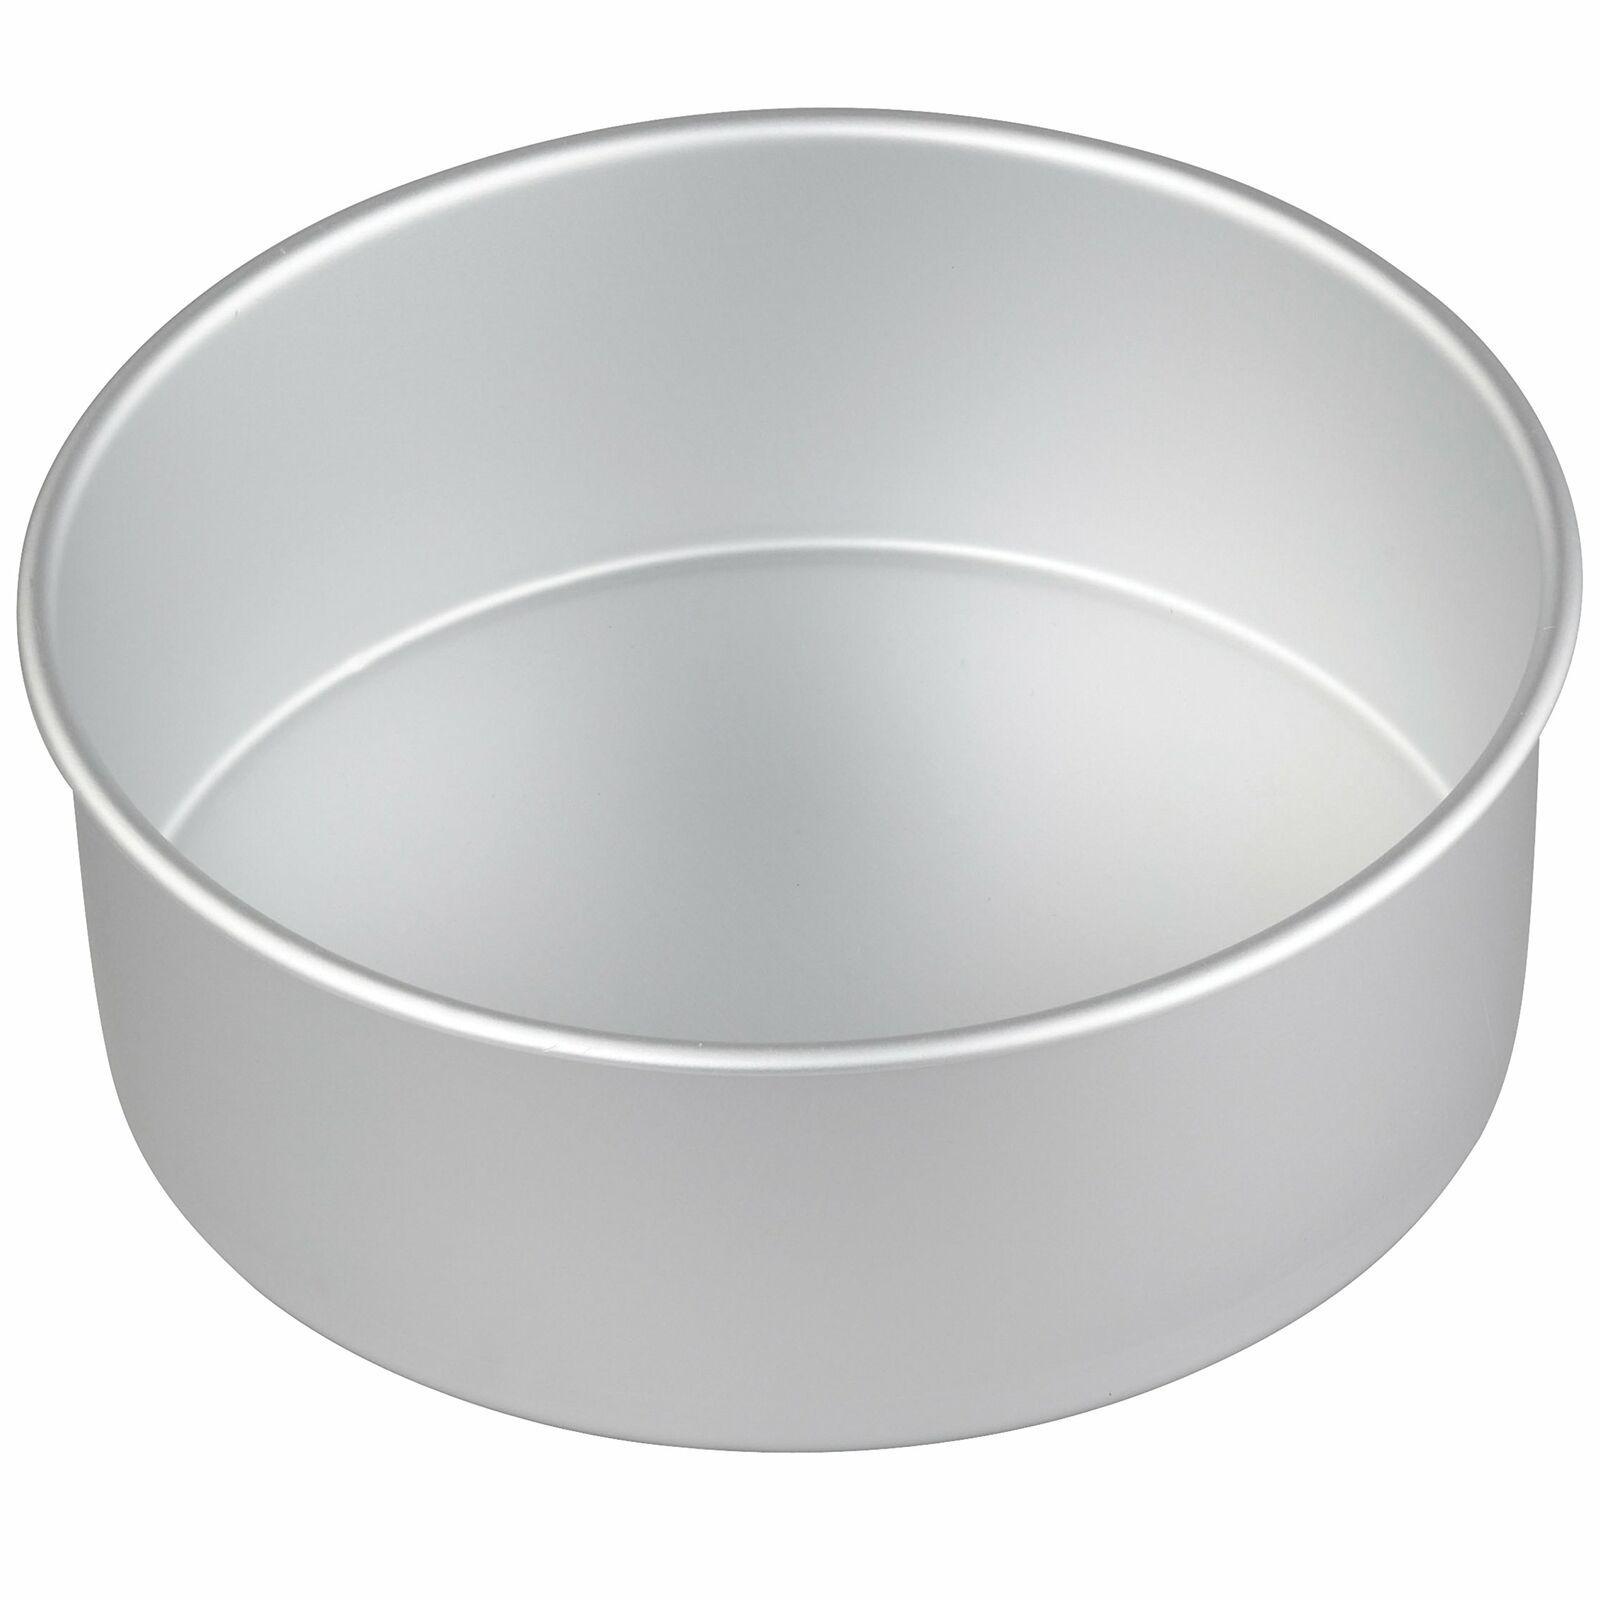 17++ 8 inch round cake pan walmart trends